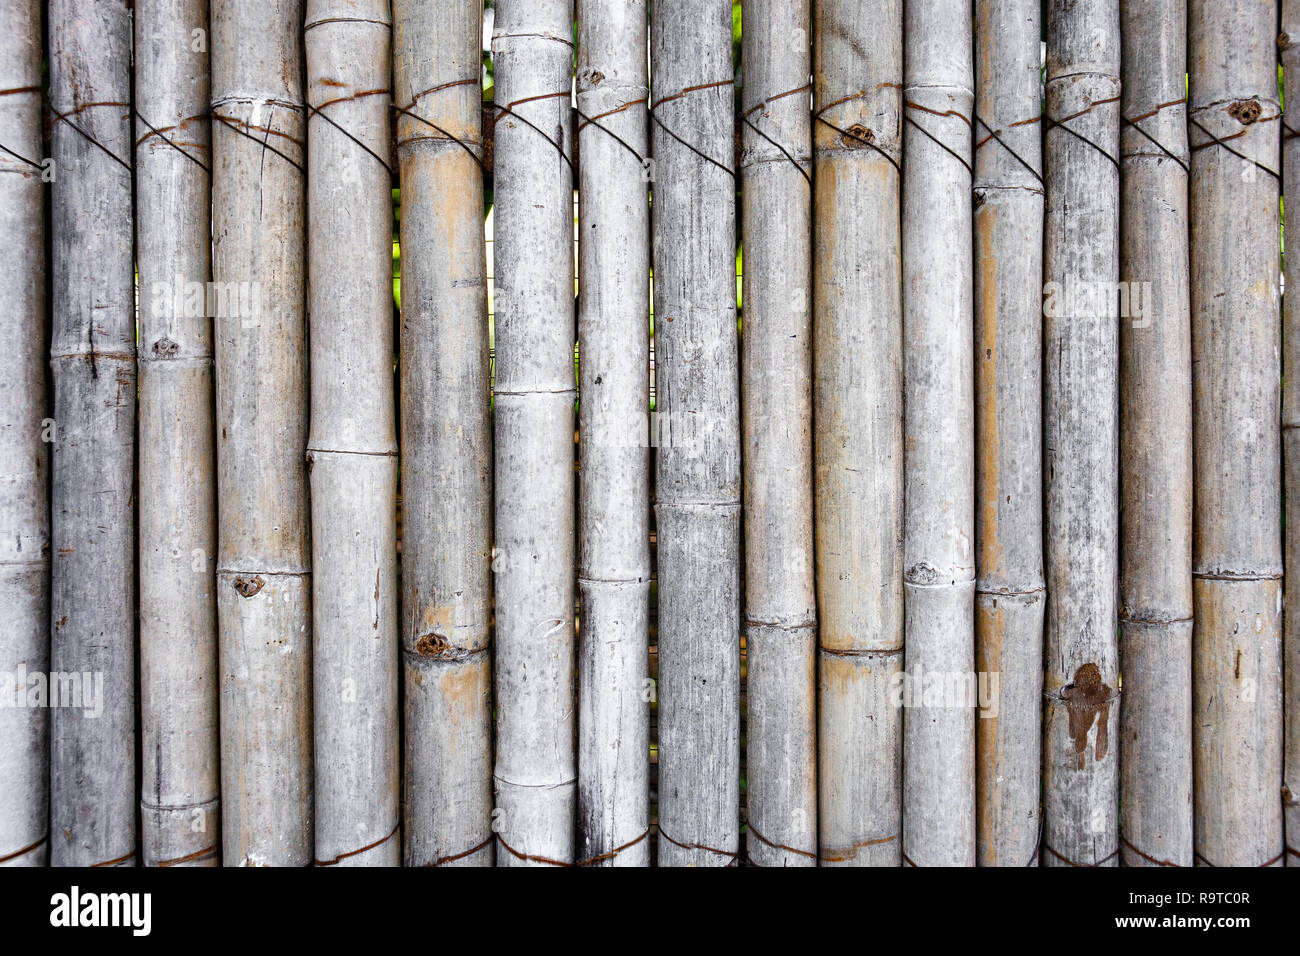 Alte Bambus Zaun In Den Garten Gemutliche Dekoration Idee Fur